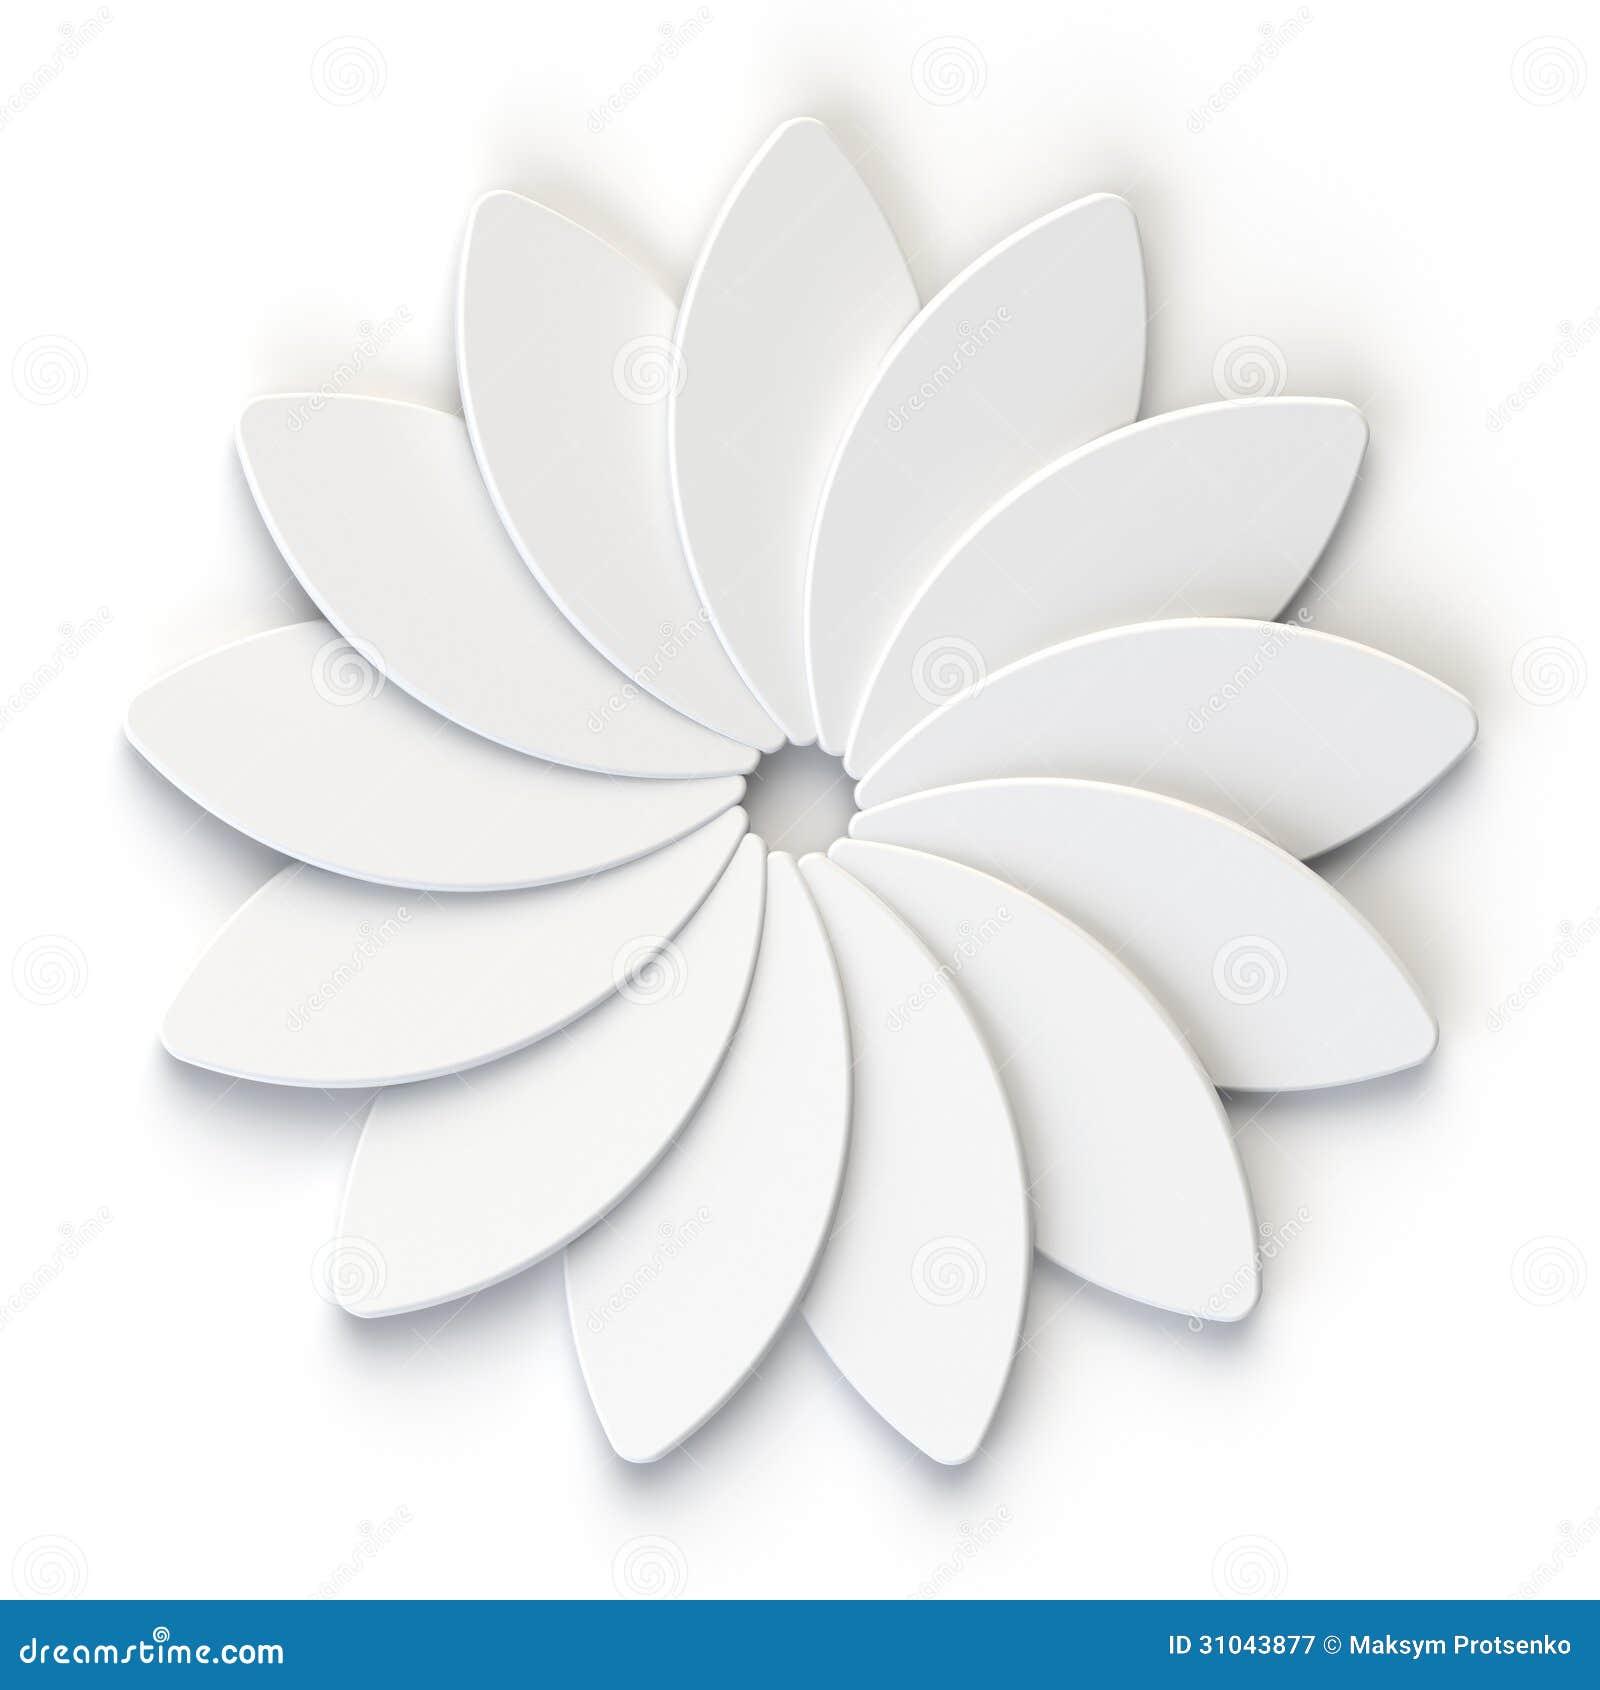 3d abstract white flower on white background royalty free for 3d white flower wallpaper